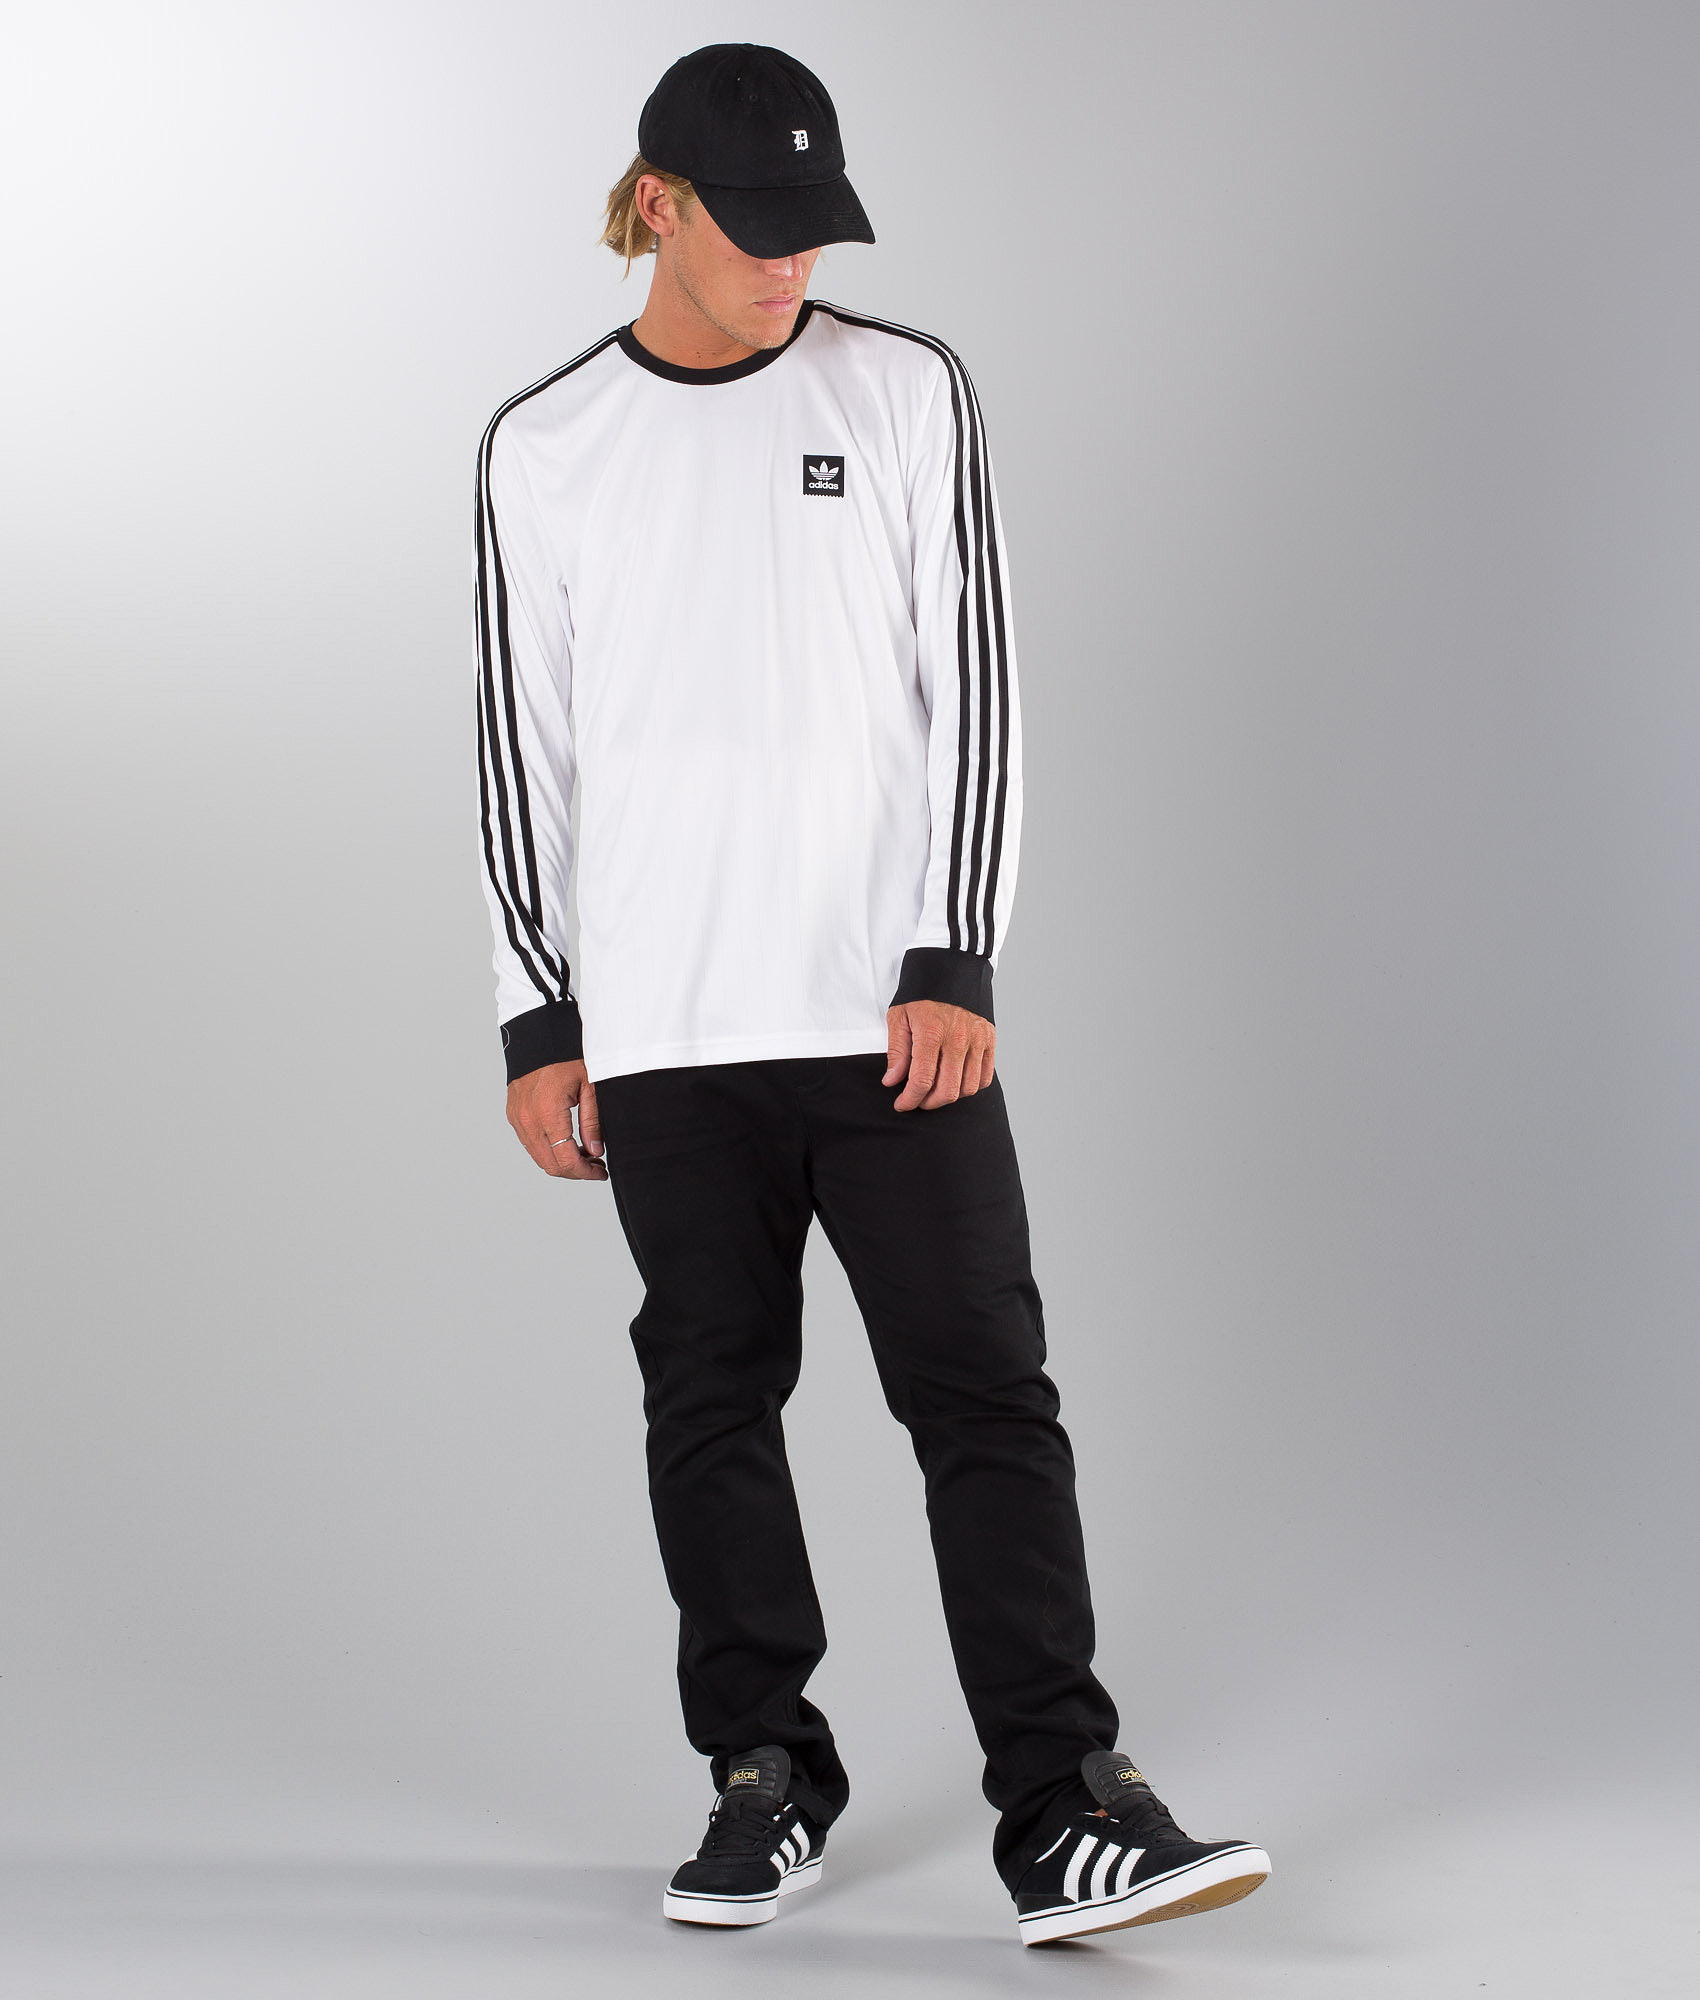 san francisco 91a6d 759e0 Adidas Skateboarding Ls Club Jersey Longsleeve